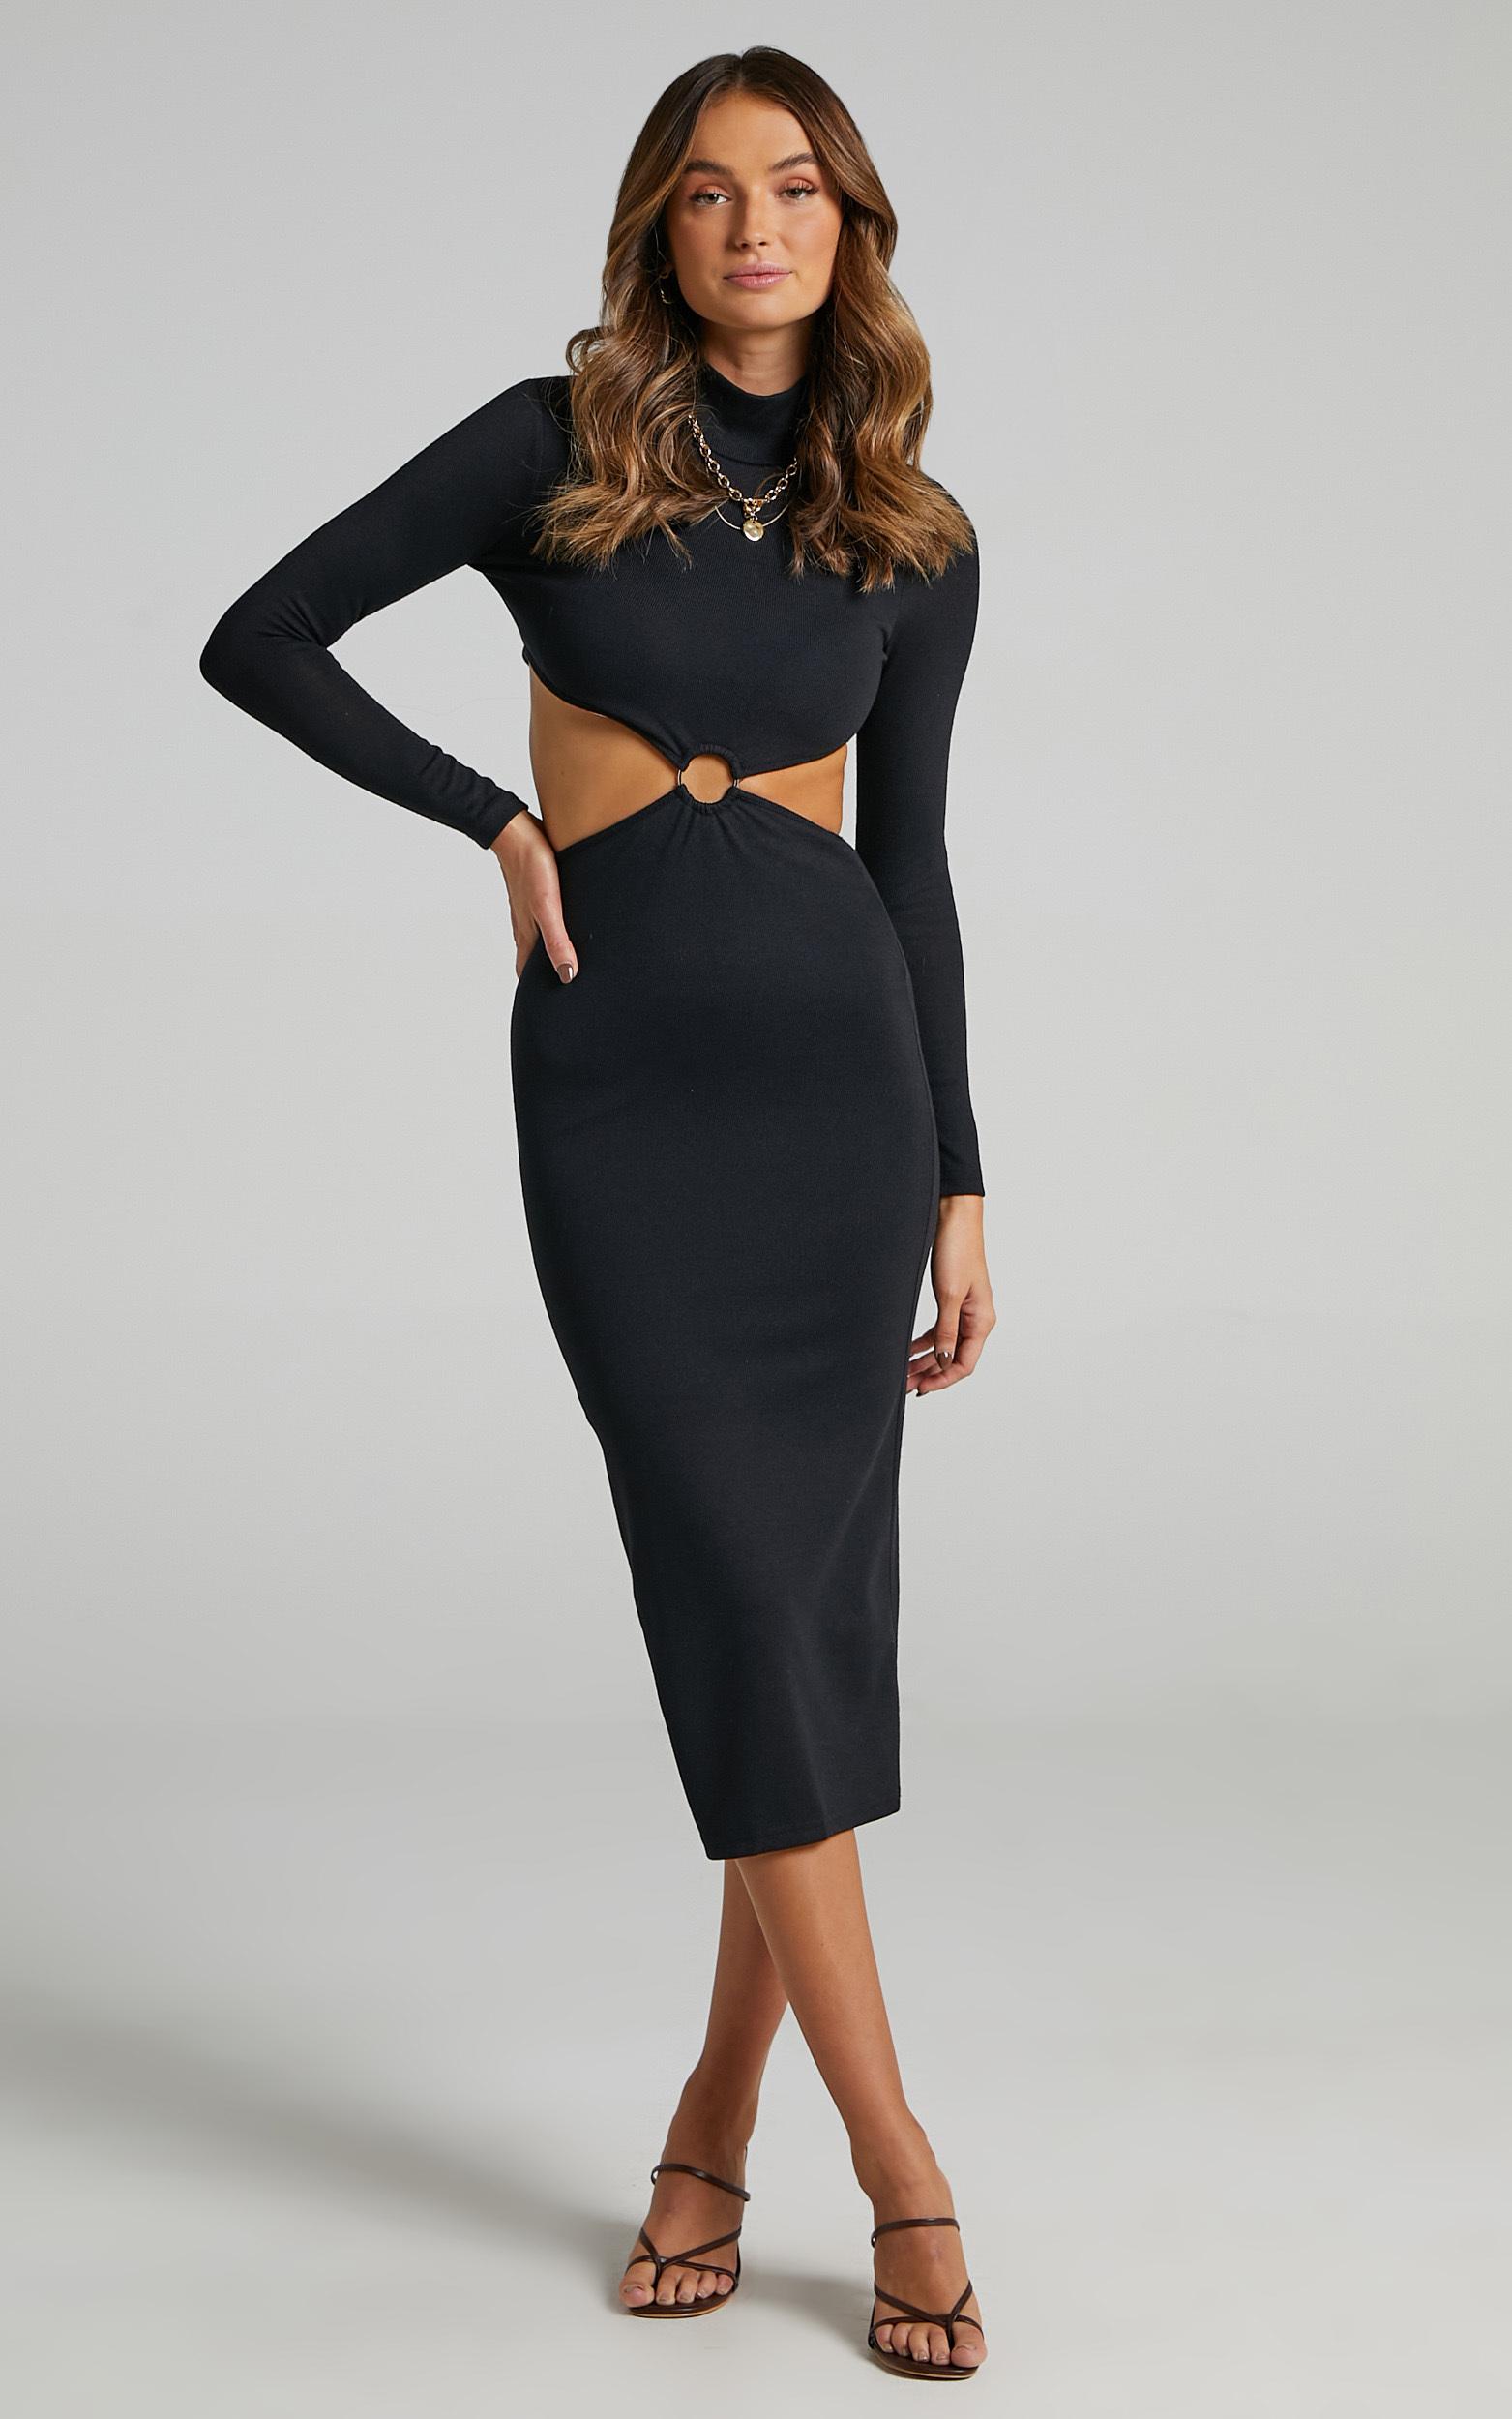 Charlene Side Cut Out High Neck Midi Dress in Black - 06, BLK1, hi-res image number null